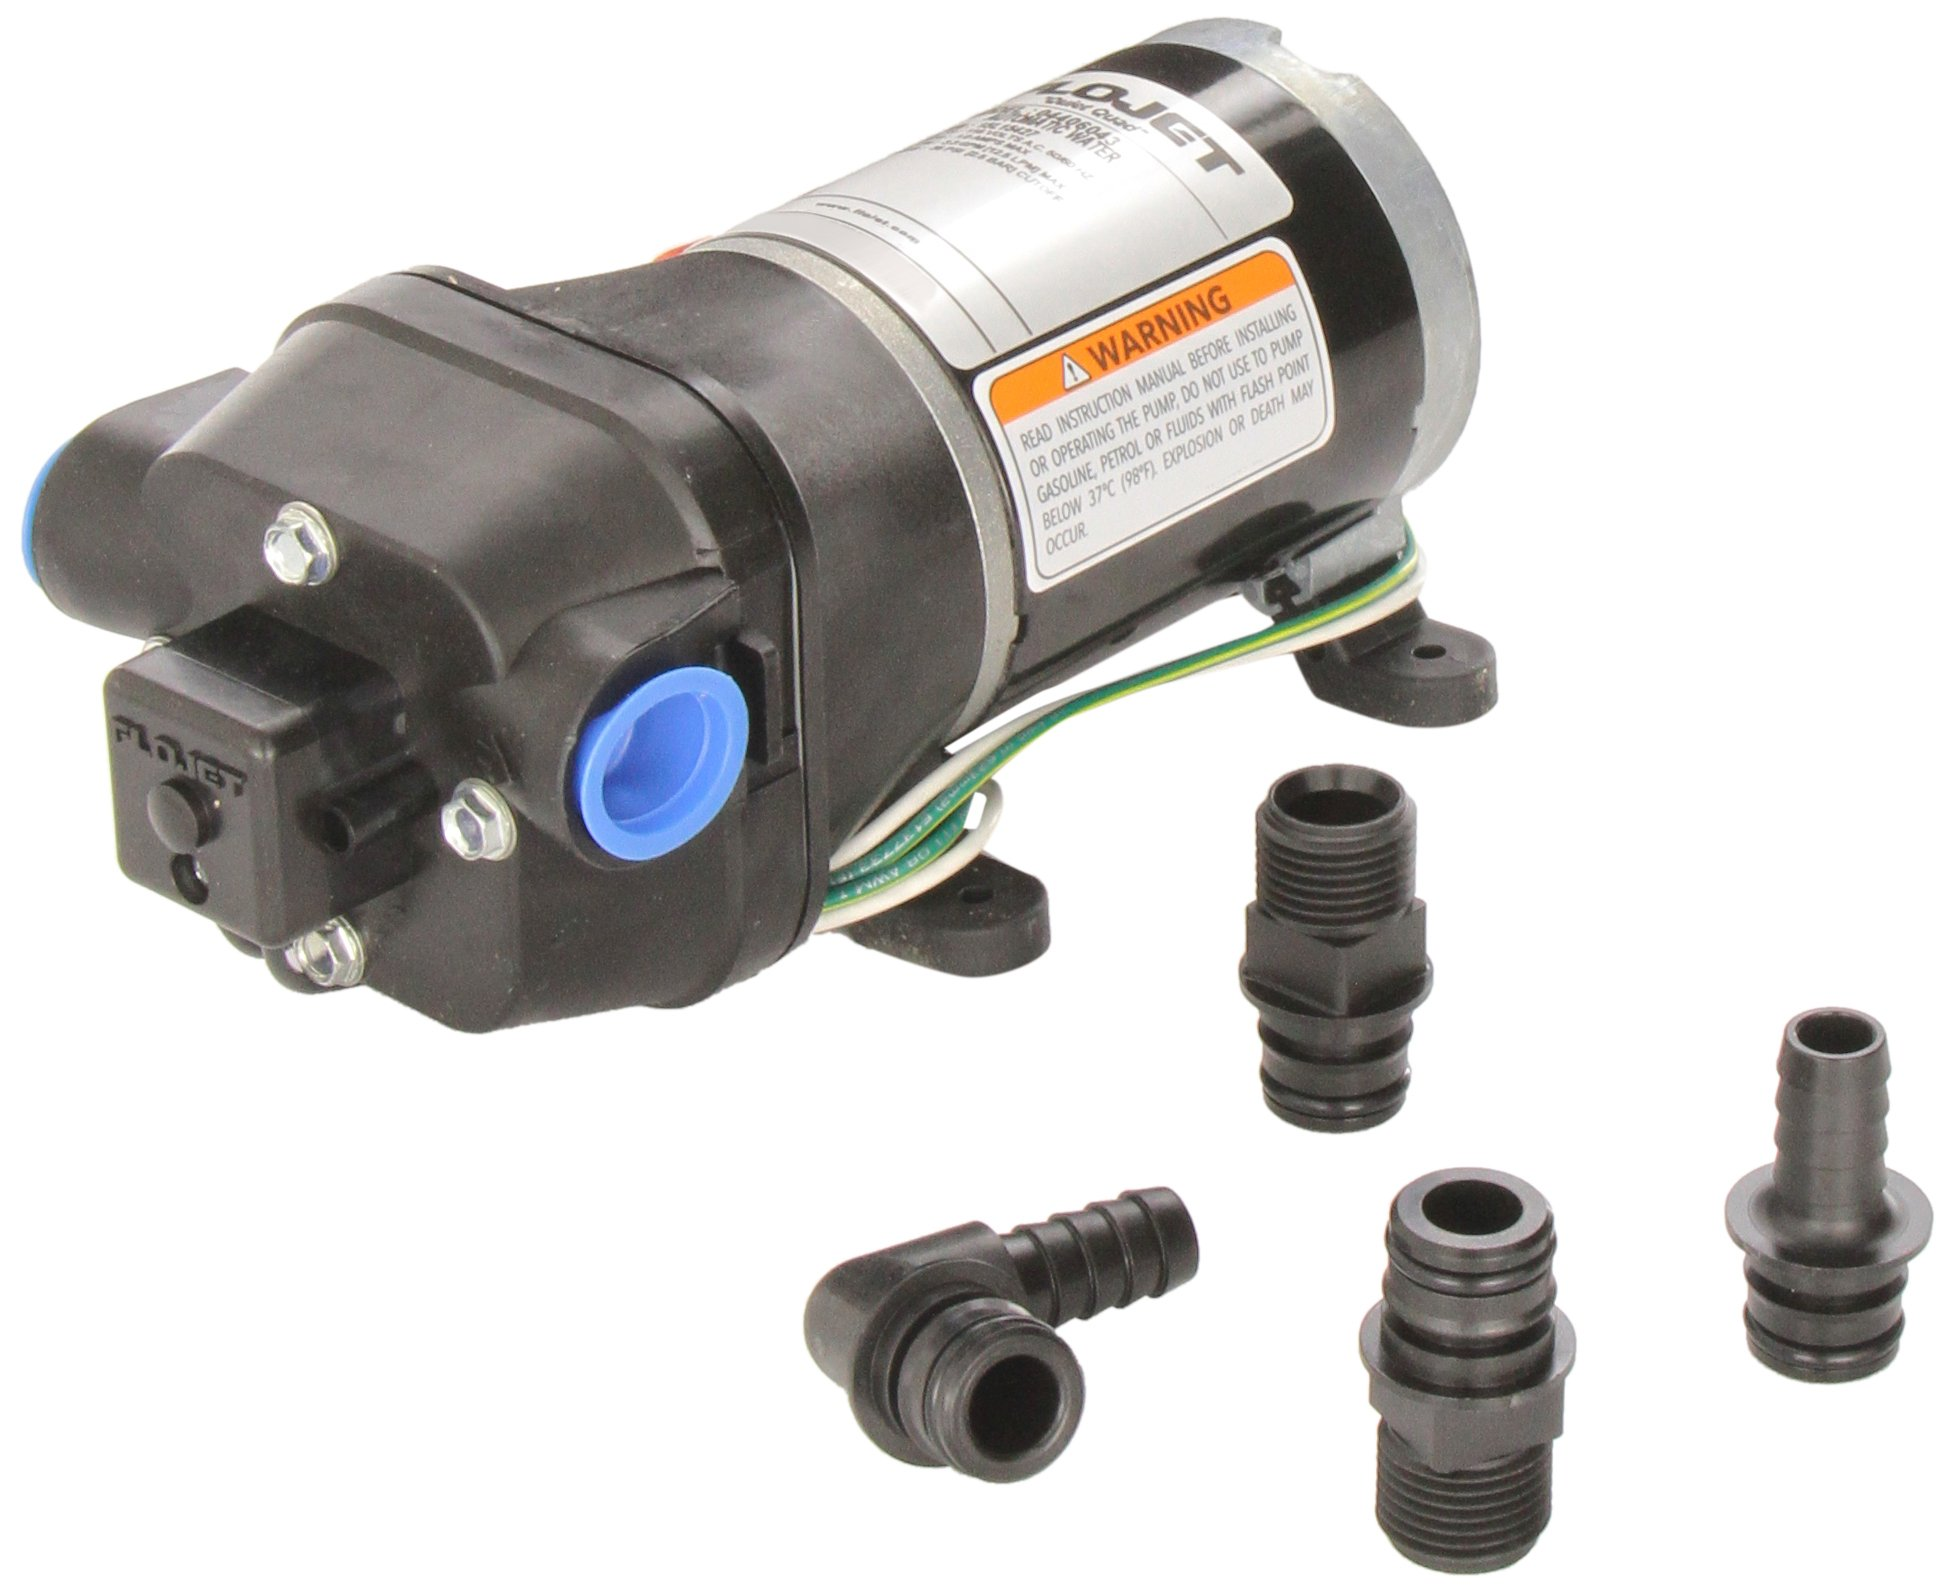 Flojet 04406043A 3.3 GPM 35 PSI 115V Quiet Quad Water Pump System by Flojet Corporation